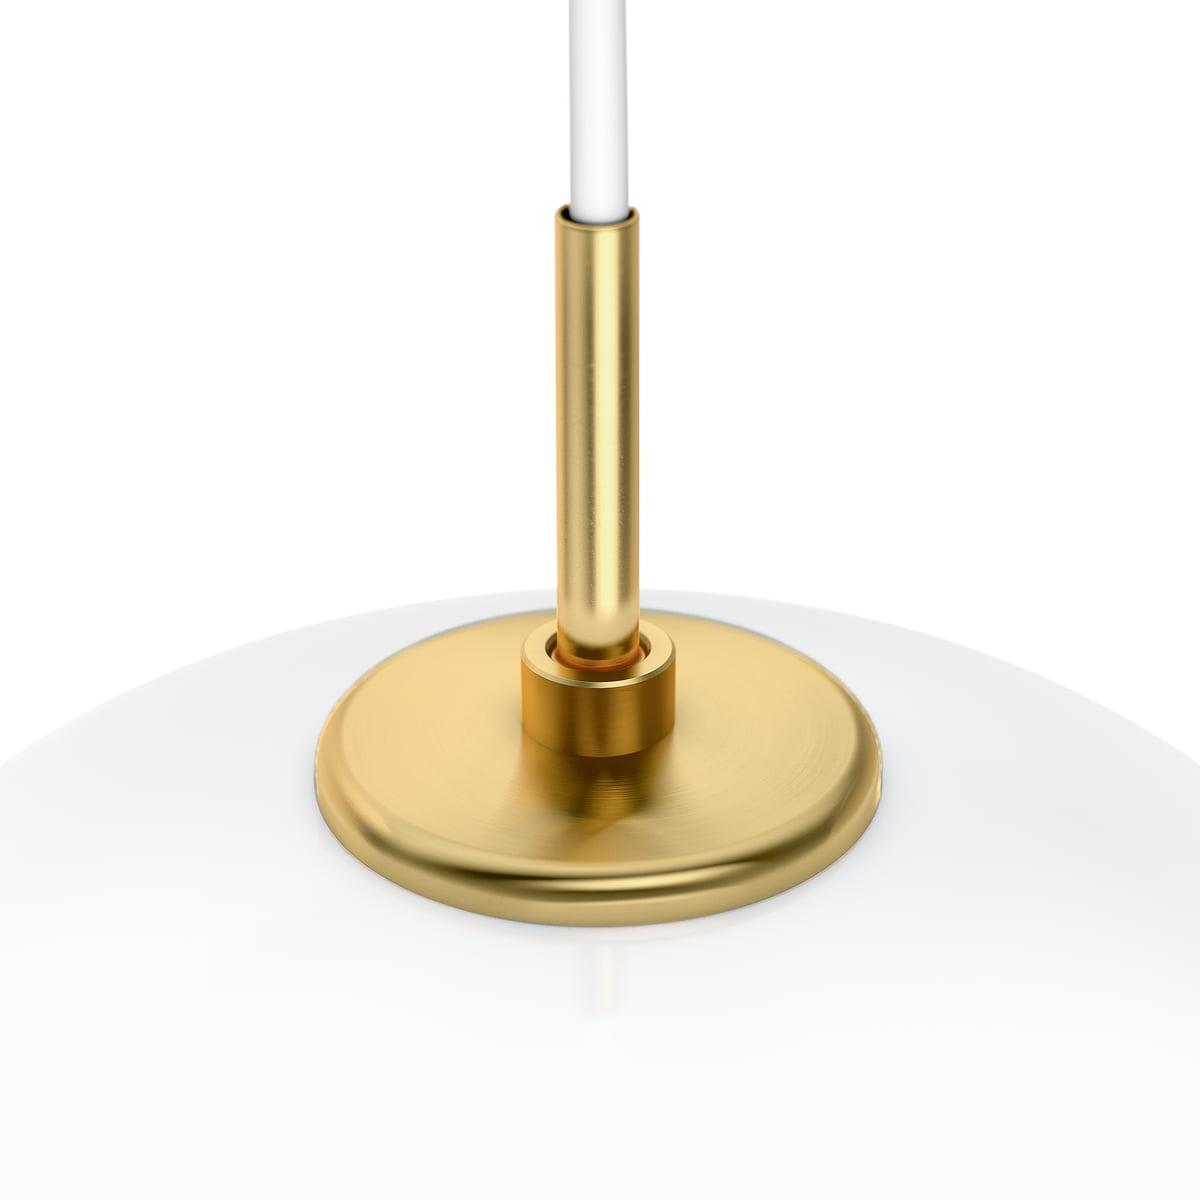 vl45 radiohus pendant lamp by louis poulsen. Black Bedroom Furniture Sets. Home Design Ideas